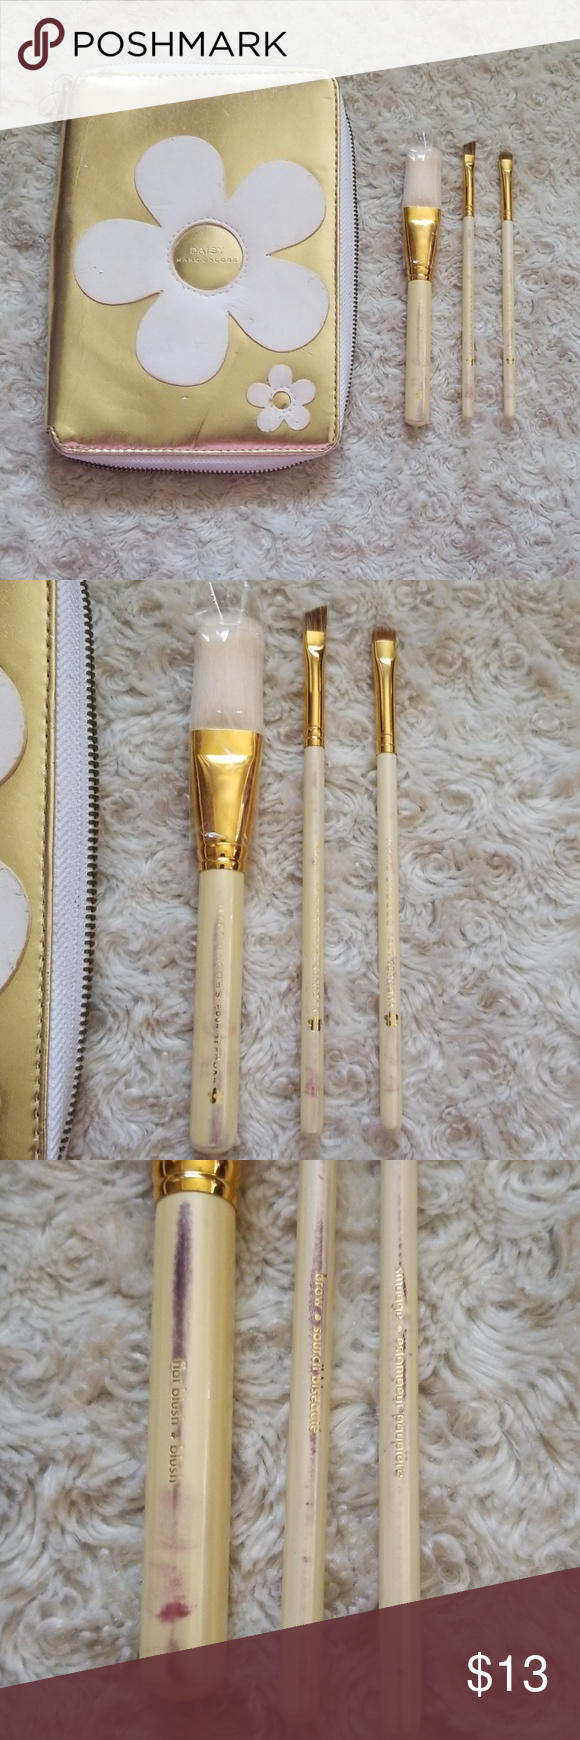 Marc Jacobs x Sephora Brush Set Sephora brush set